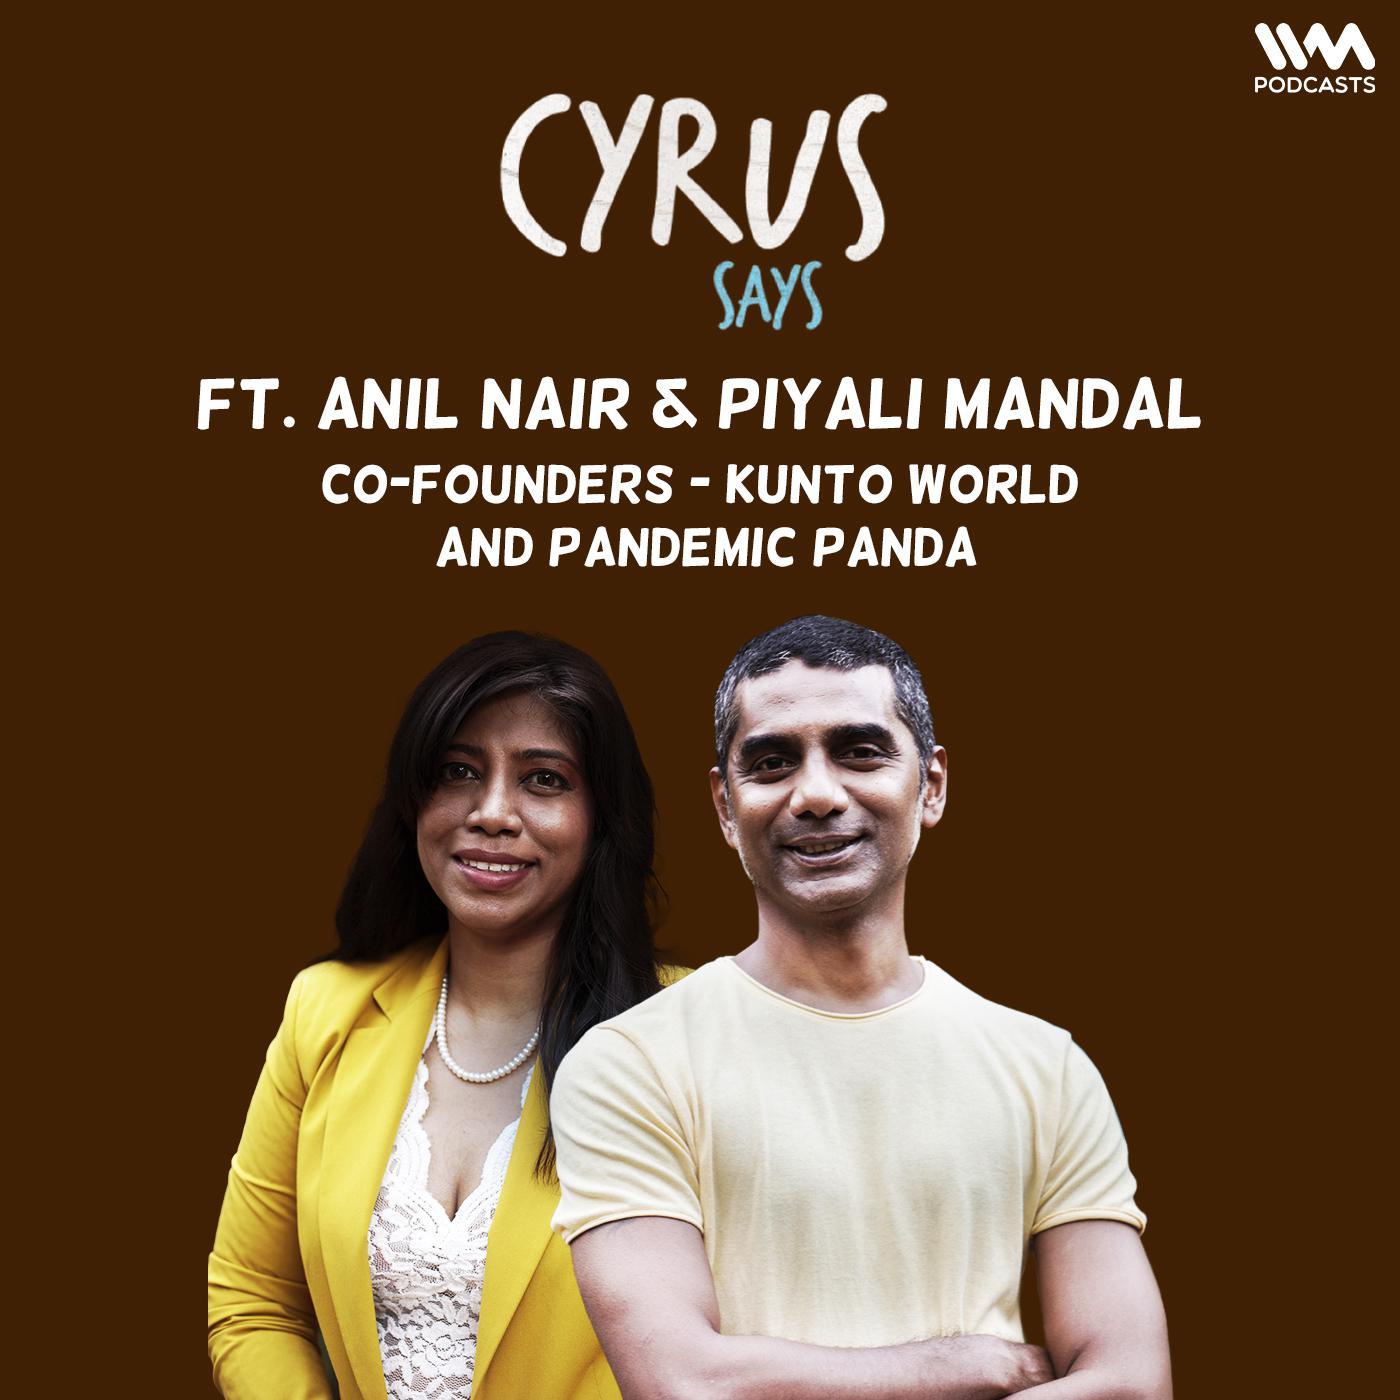 Ep. 687: feat. Anil Nair & Piyali Mandal